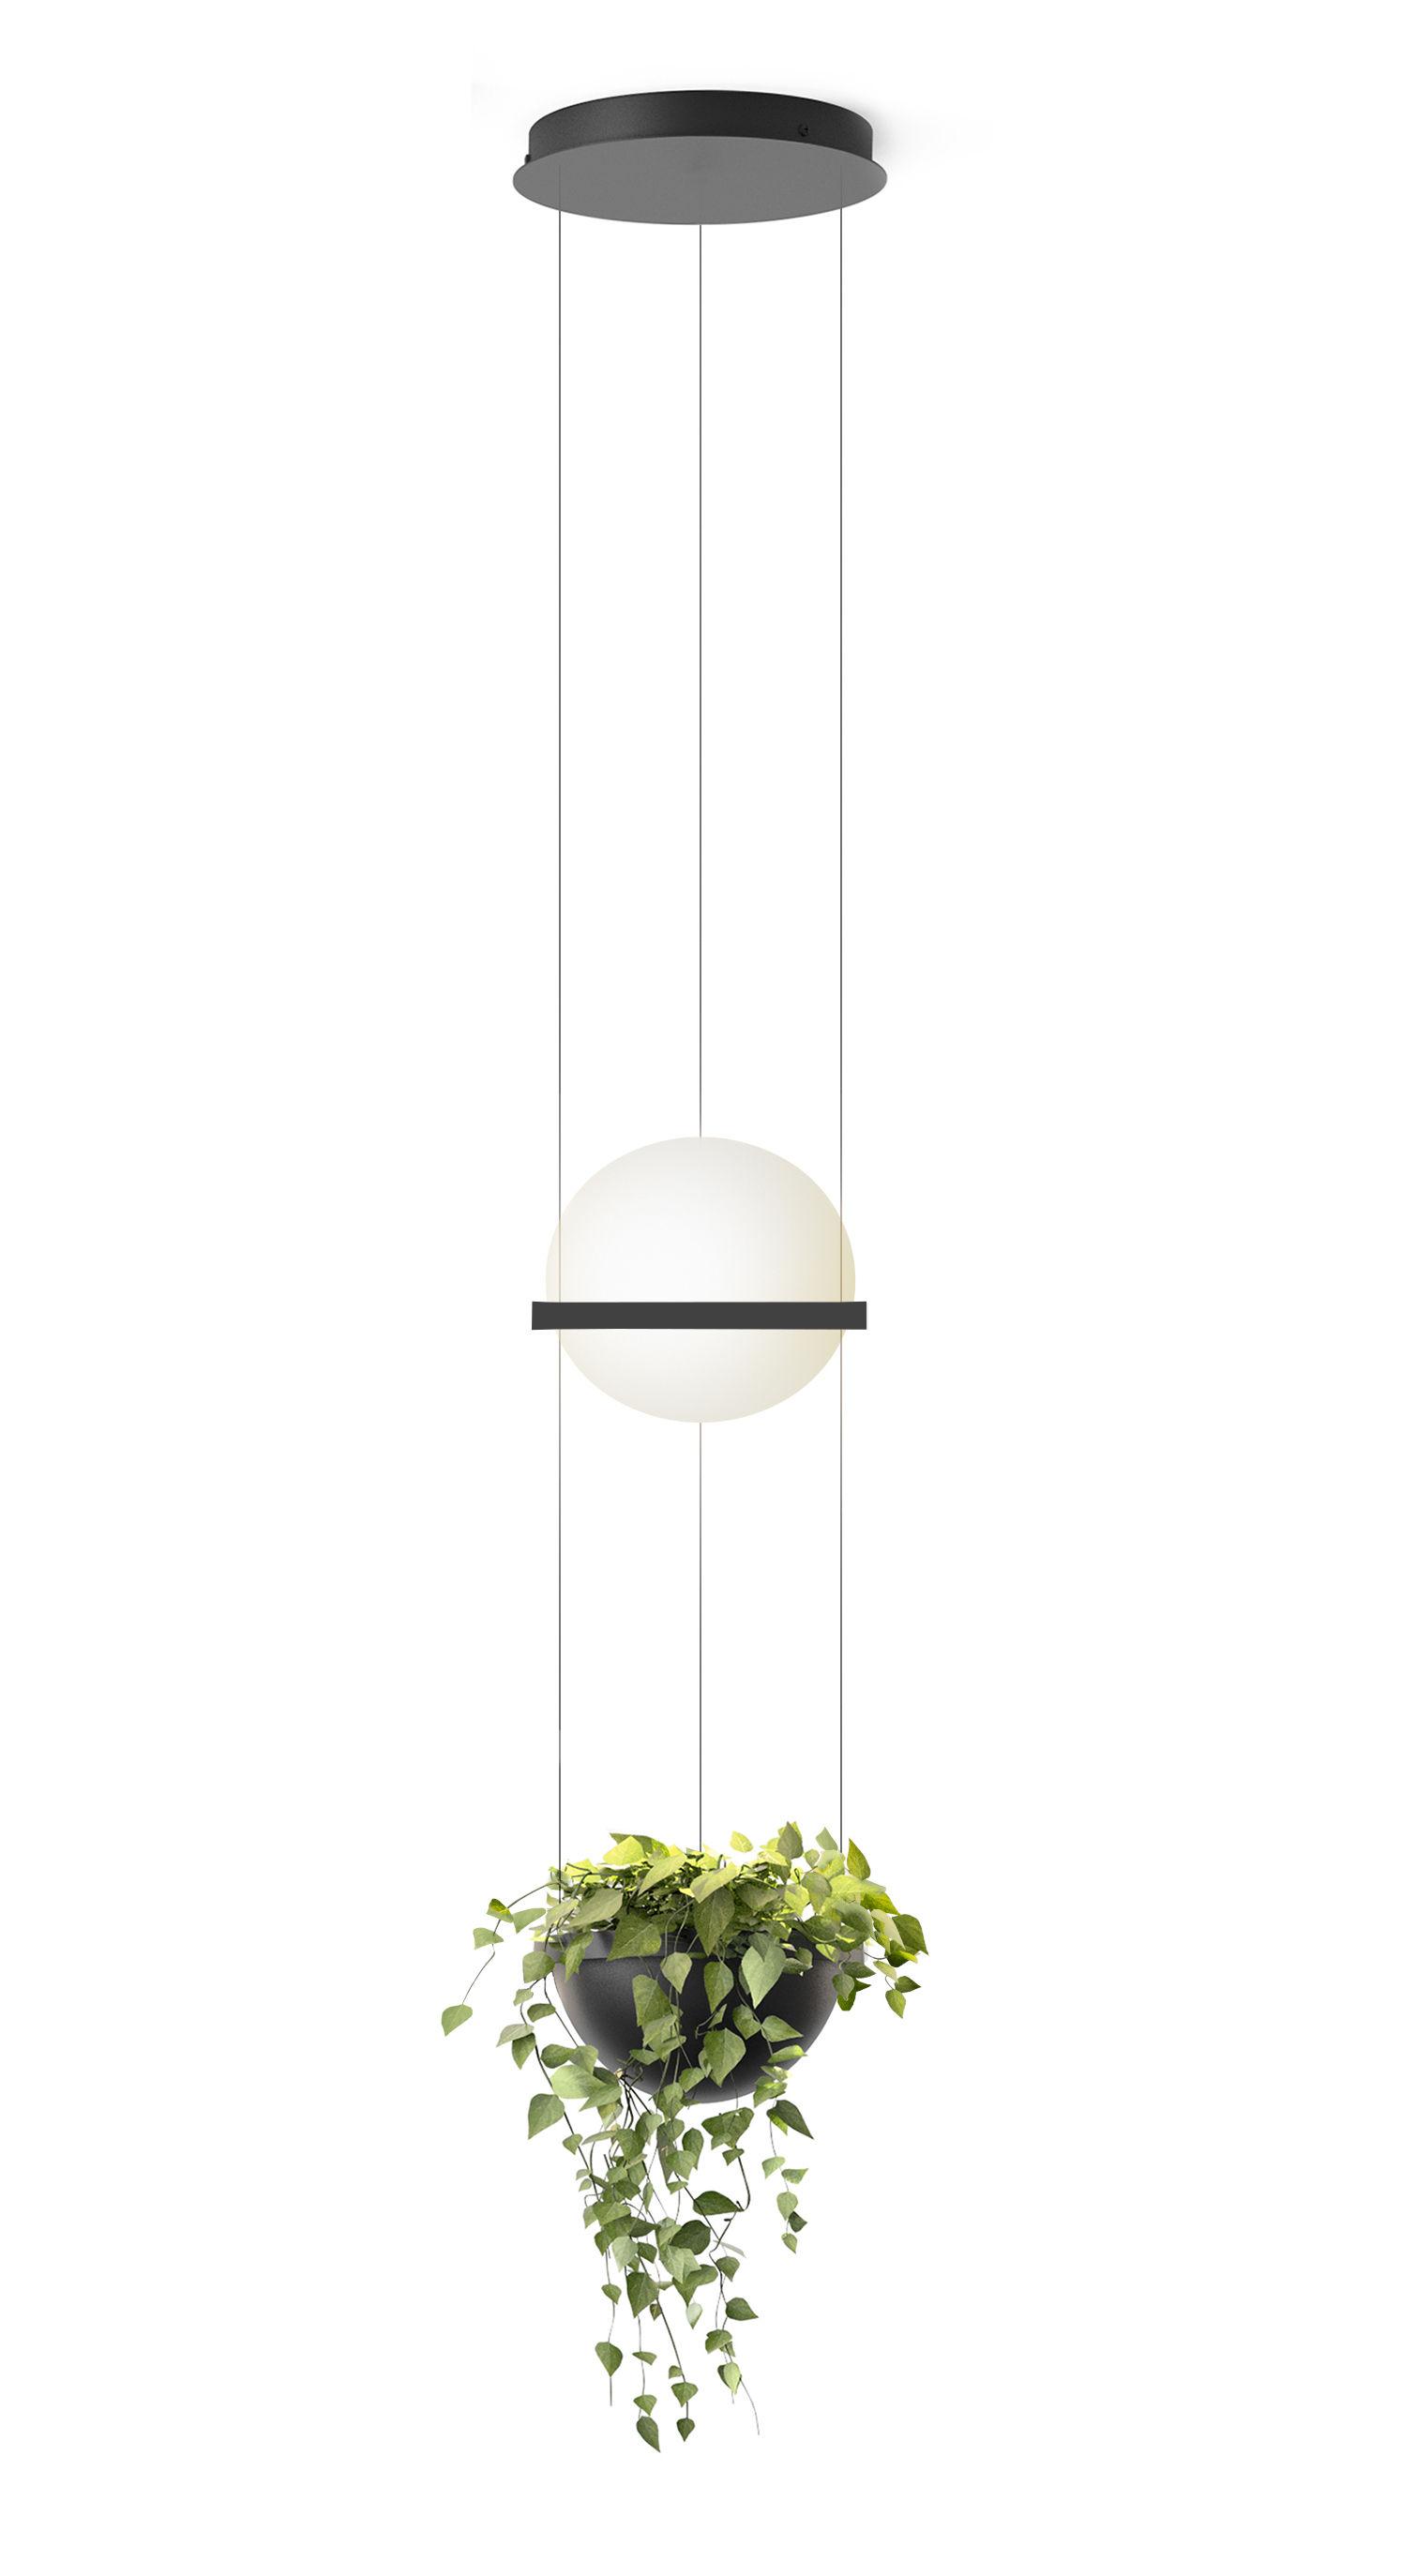 Lighting - Wall Lights - Palma Pendant - / Vertical & planter by Vibia - Matte graphite lacquer - Aluminium, Opalin mouth blown glass, PMMA